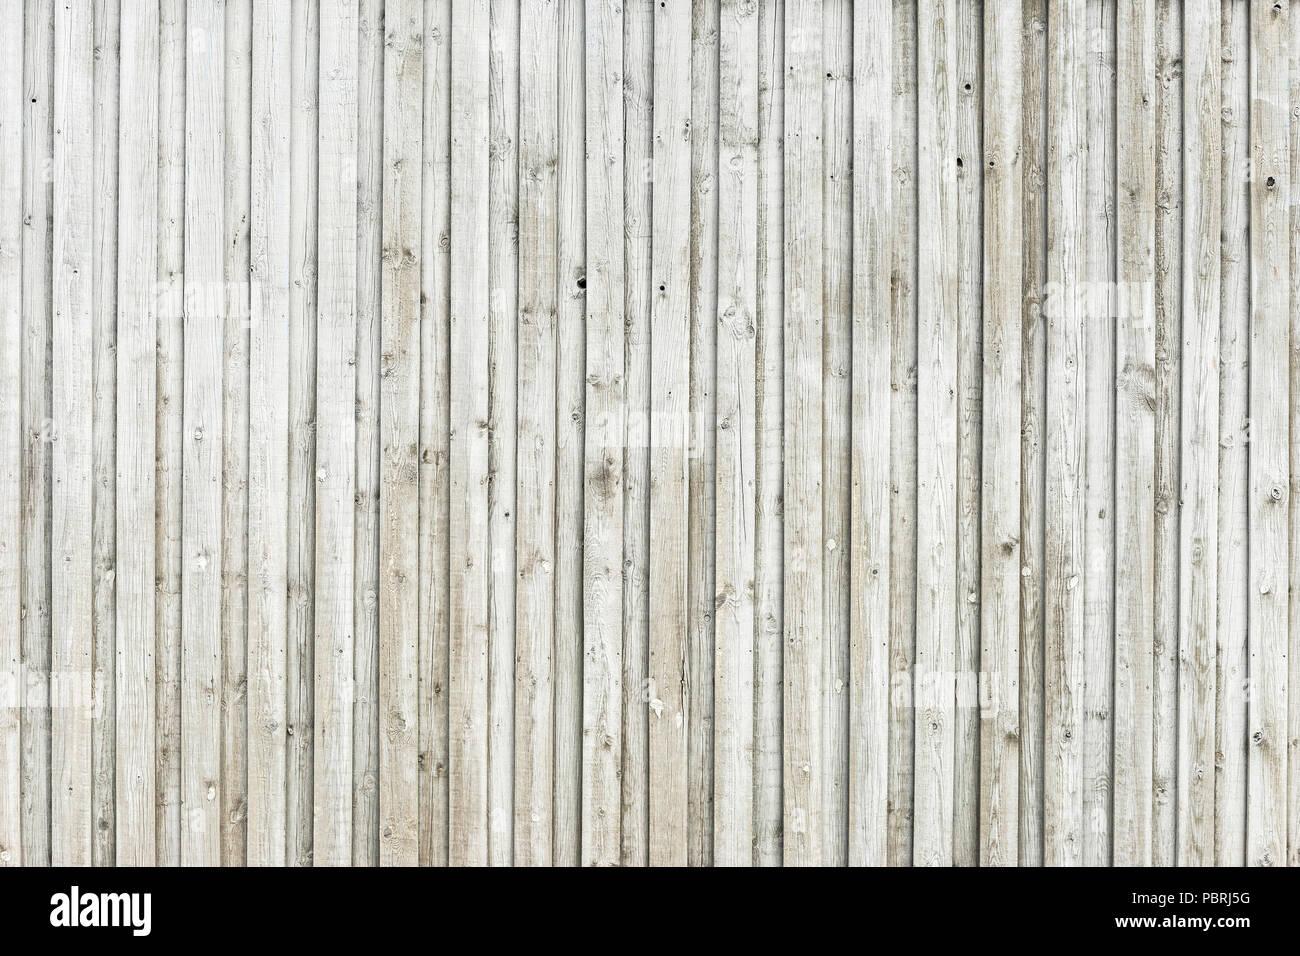 Holz- wand aus horizontal angeordneten unbemalte Boards, das Hintergrundbild Stockbild